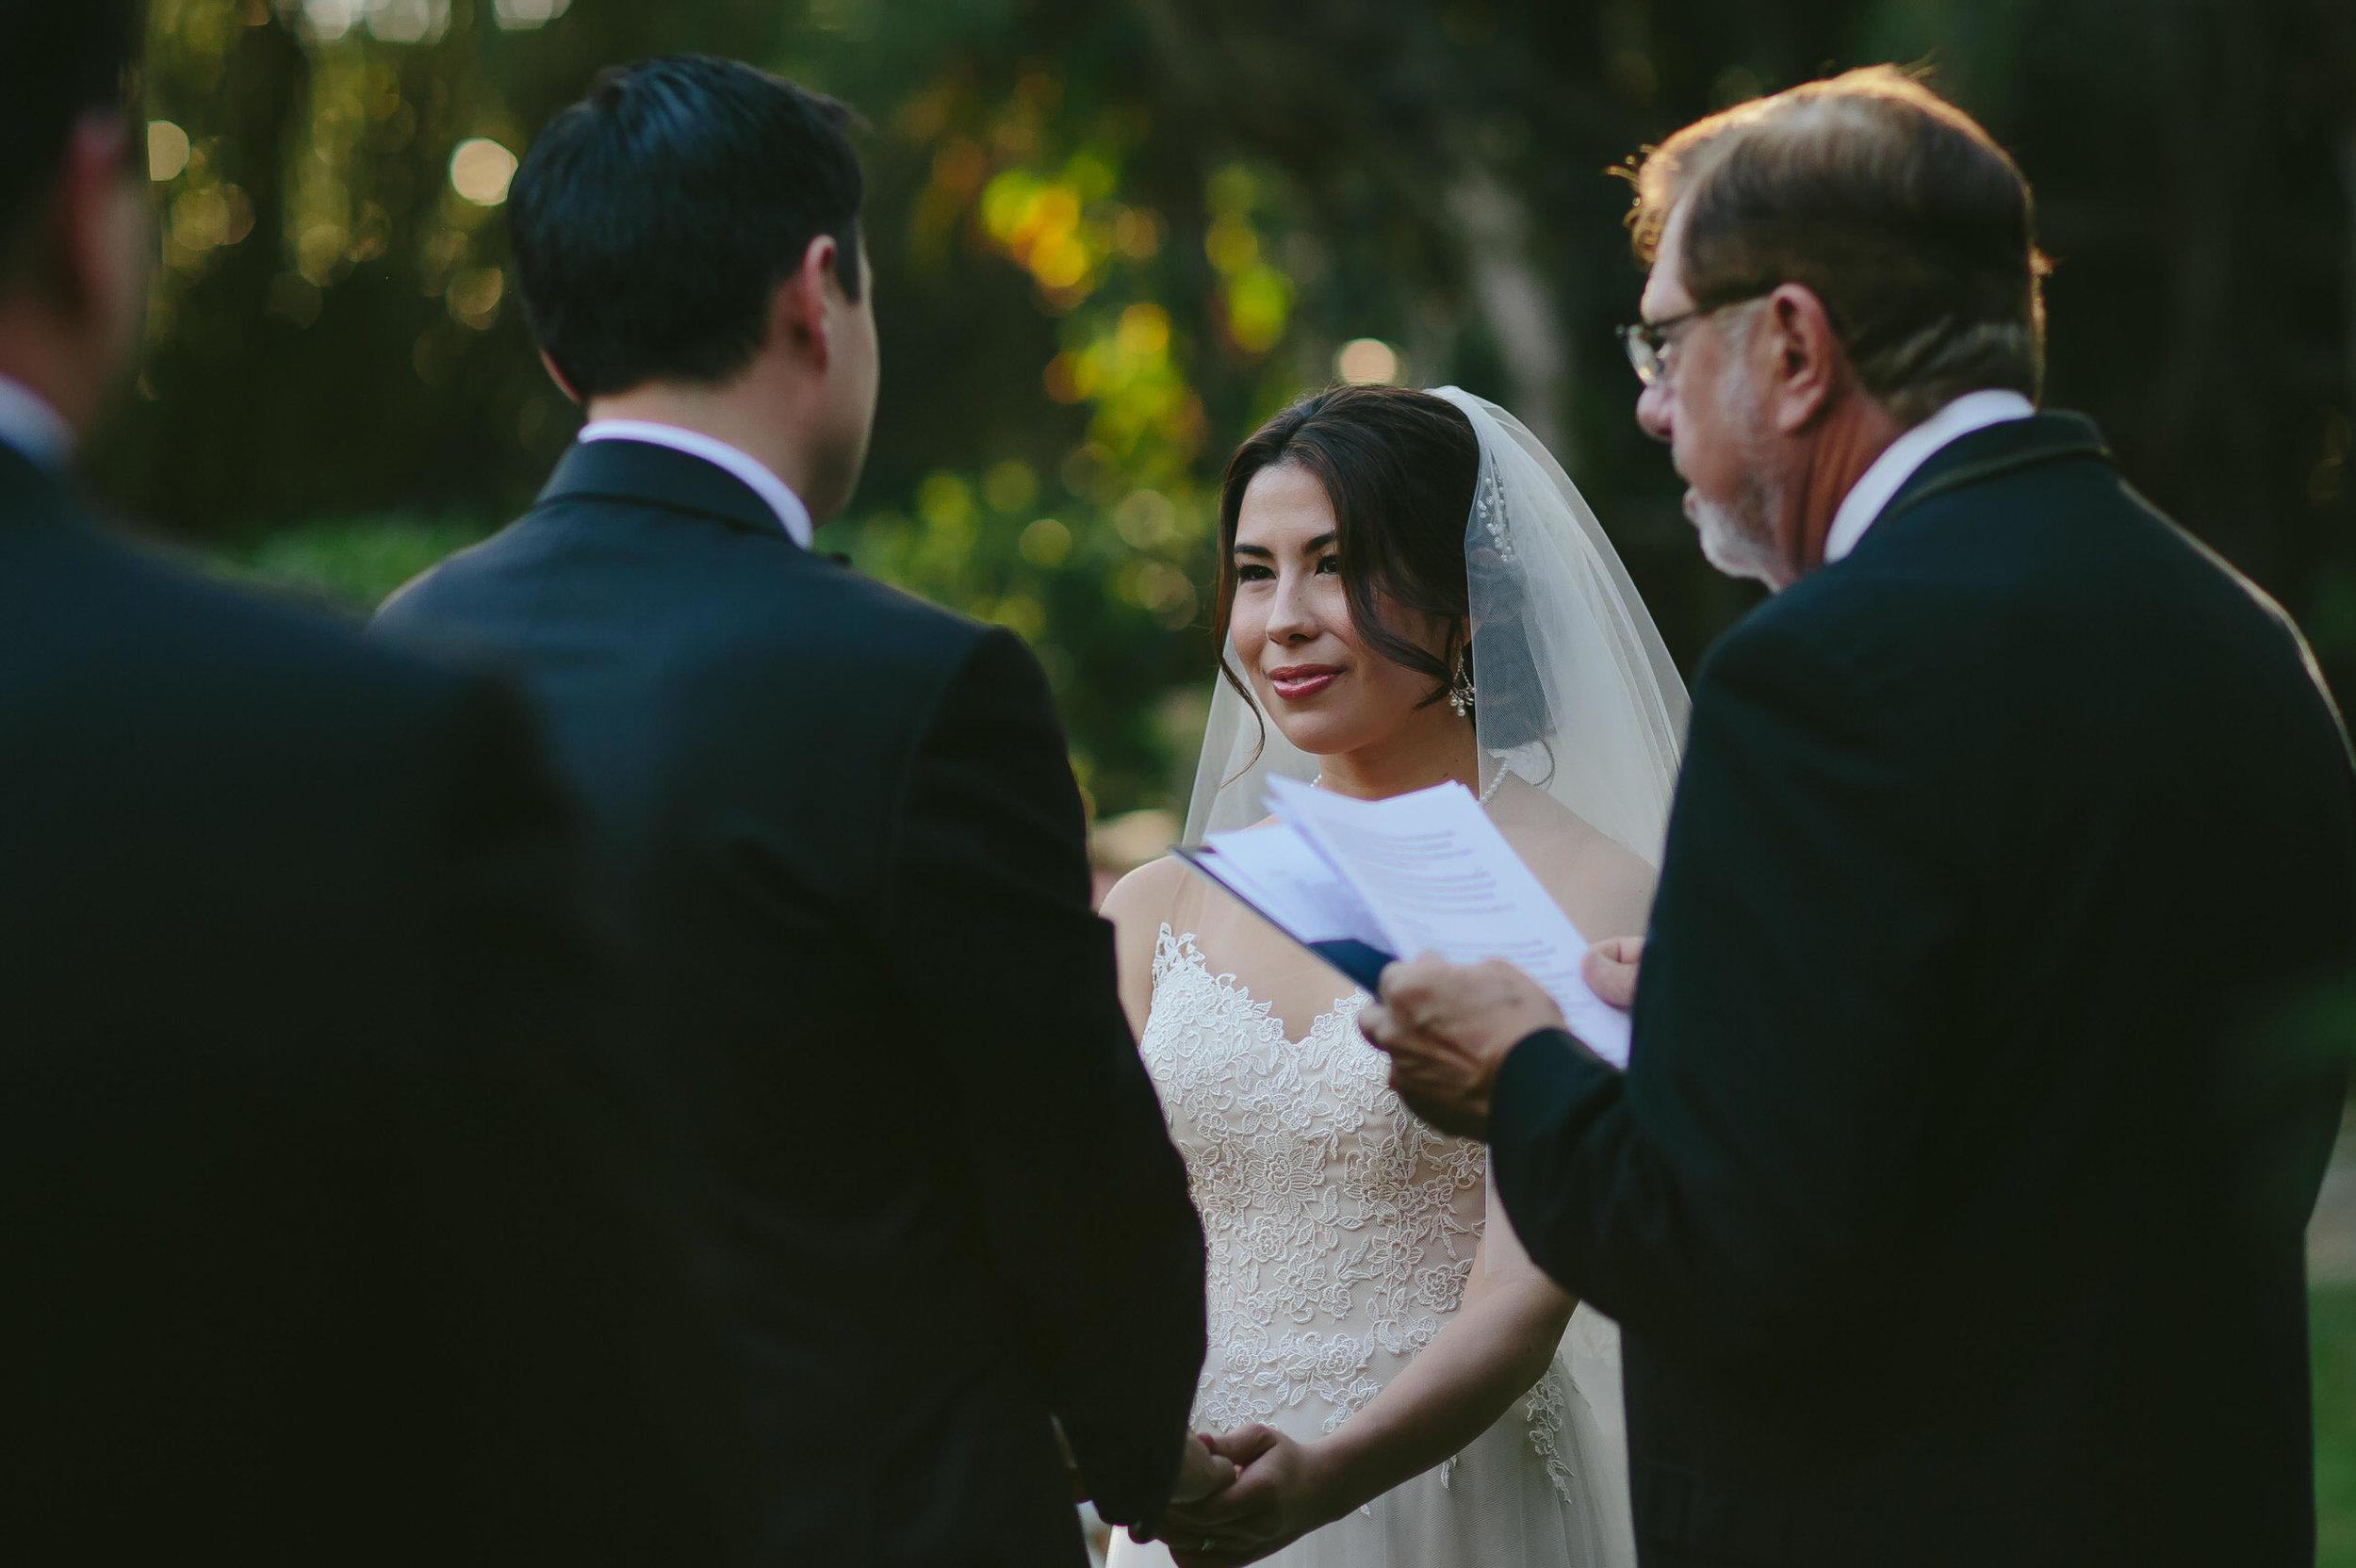 backyard_wedding_ceremony_tiny_house_photo.jpg